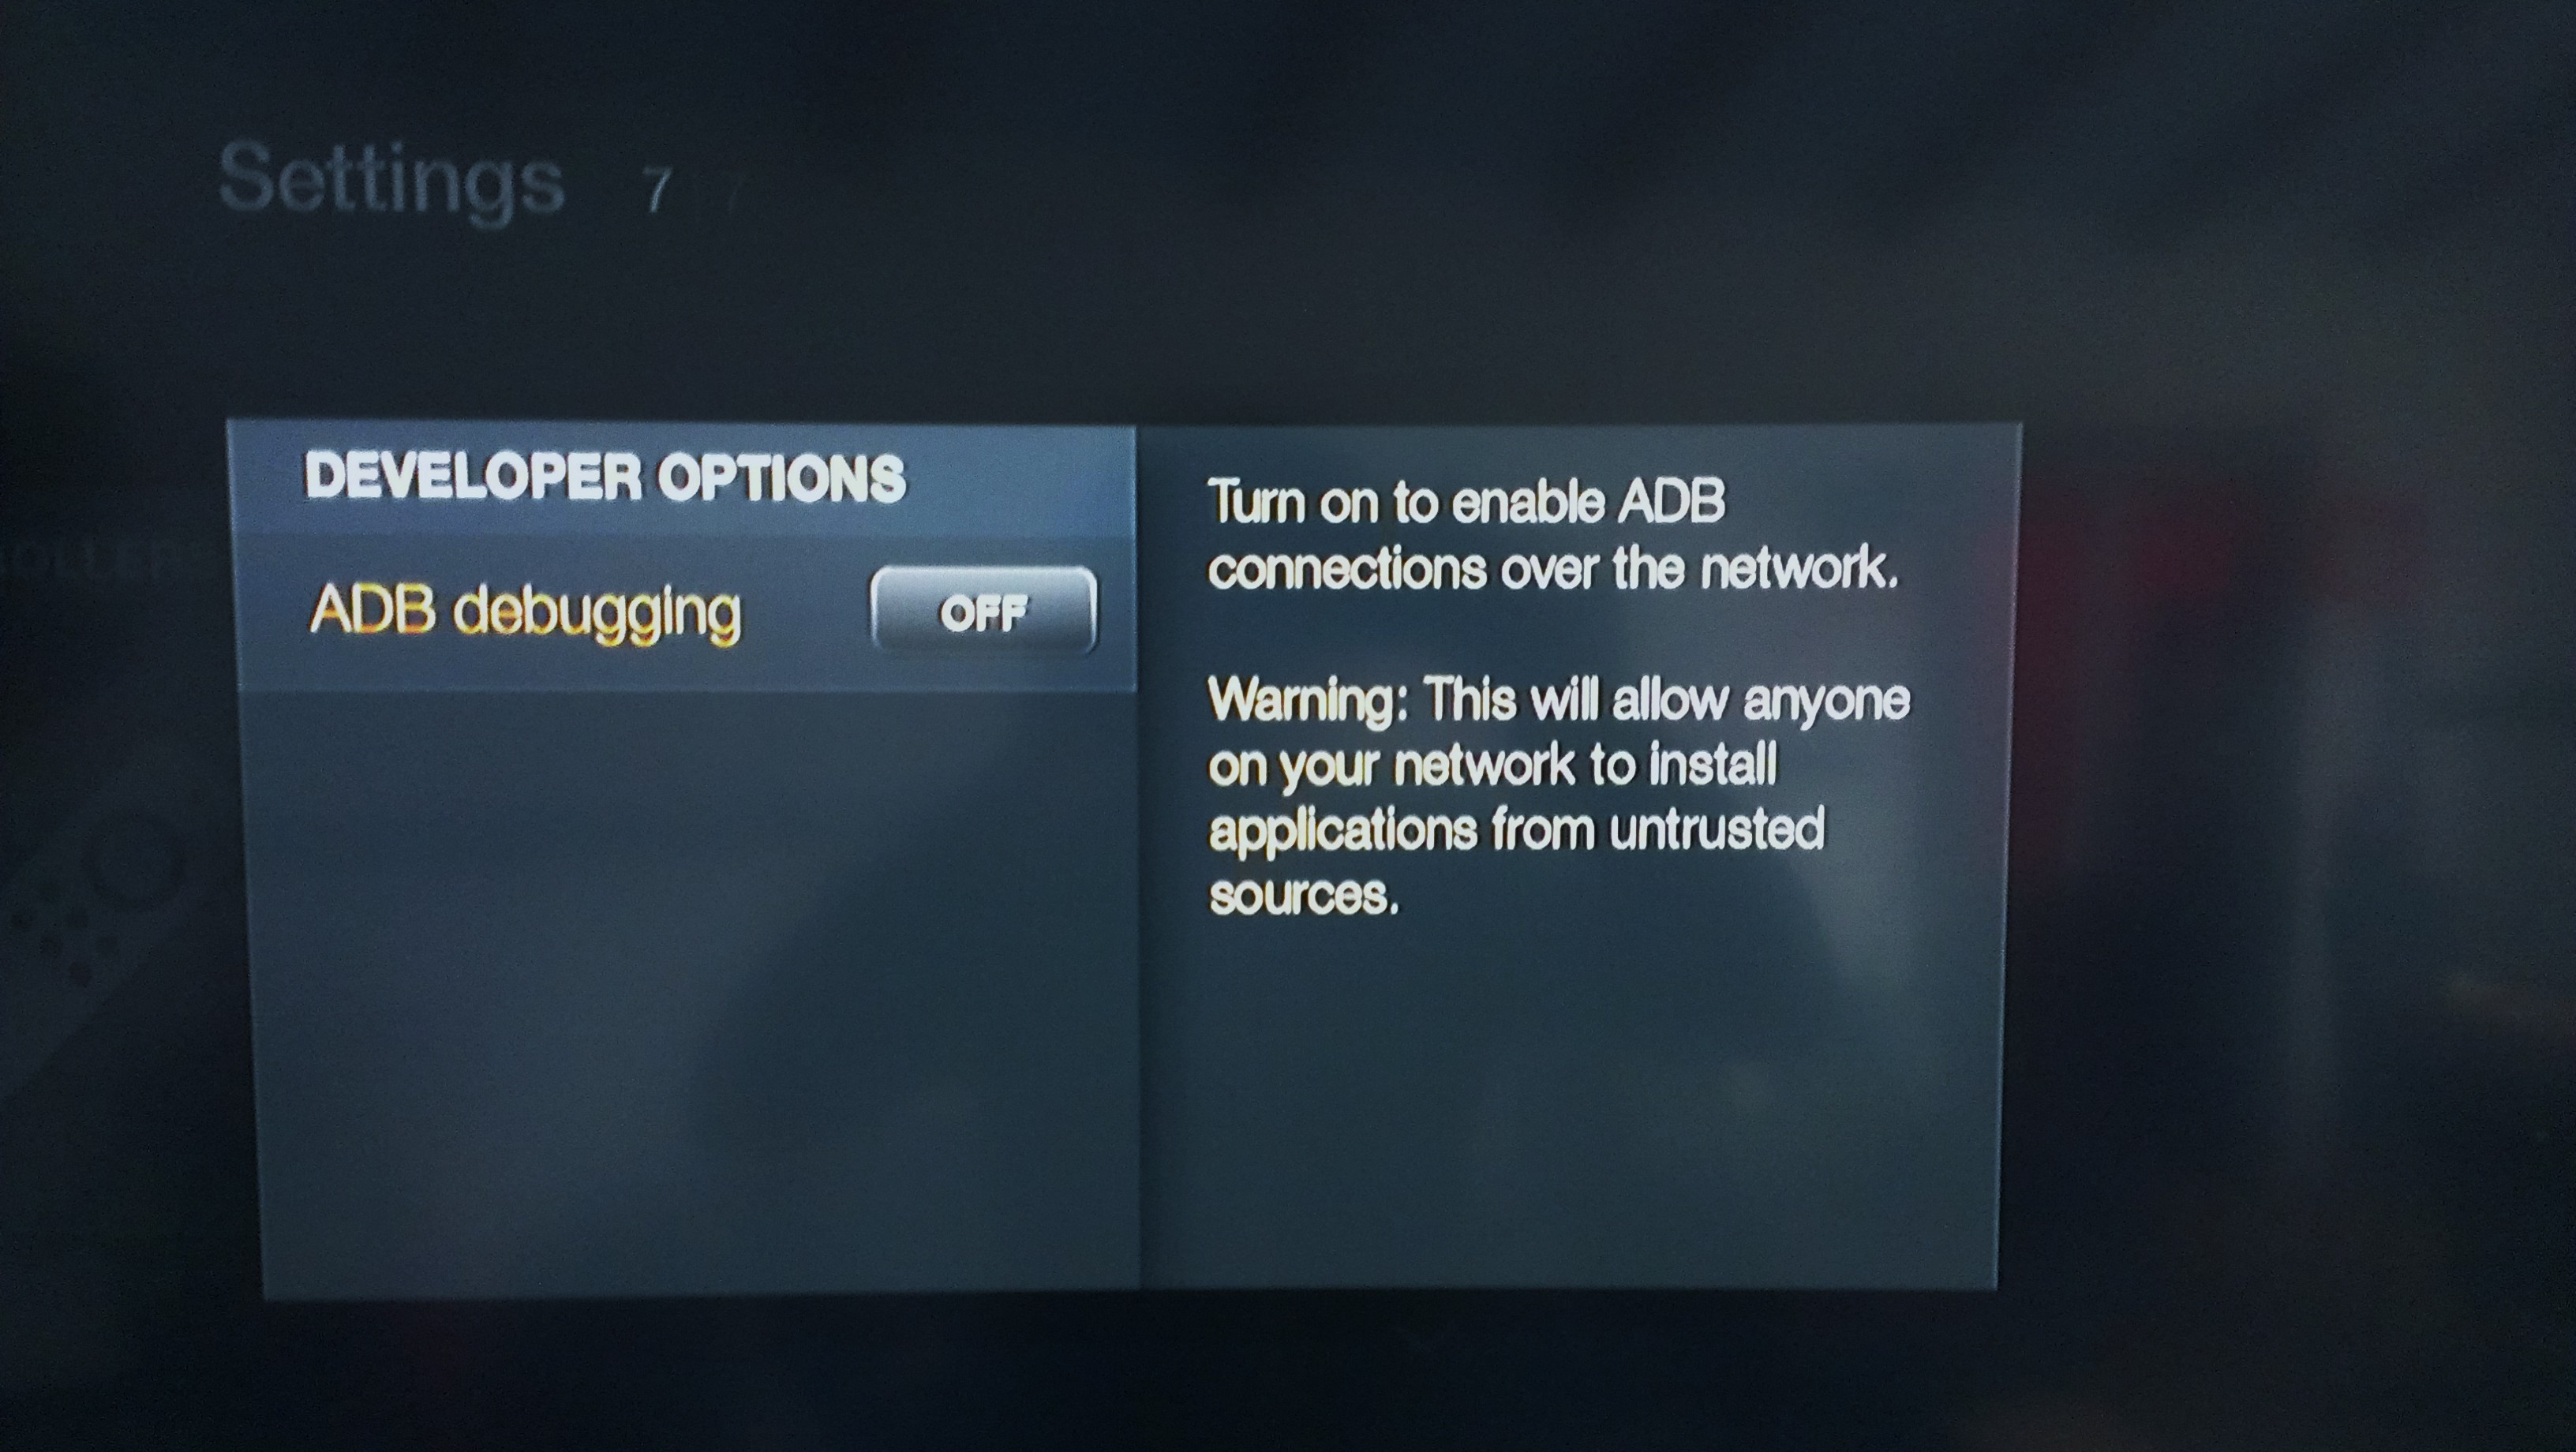 Fire TV ADB options